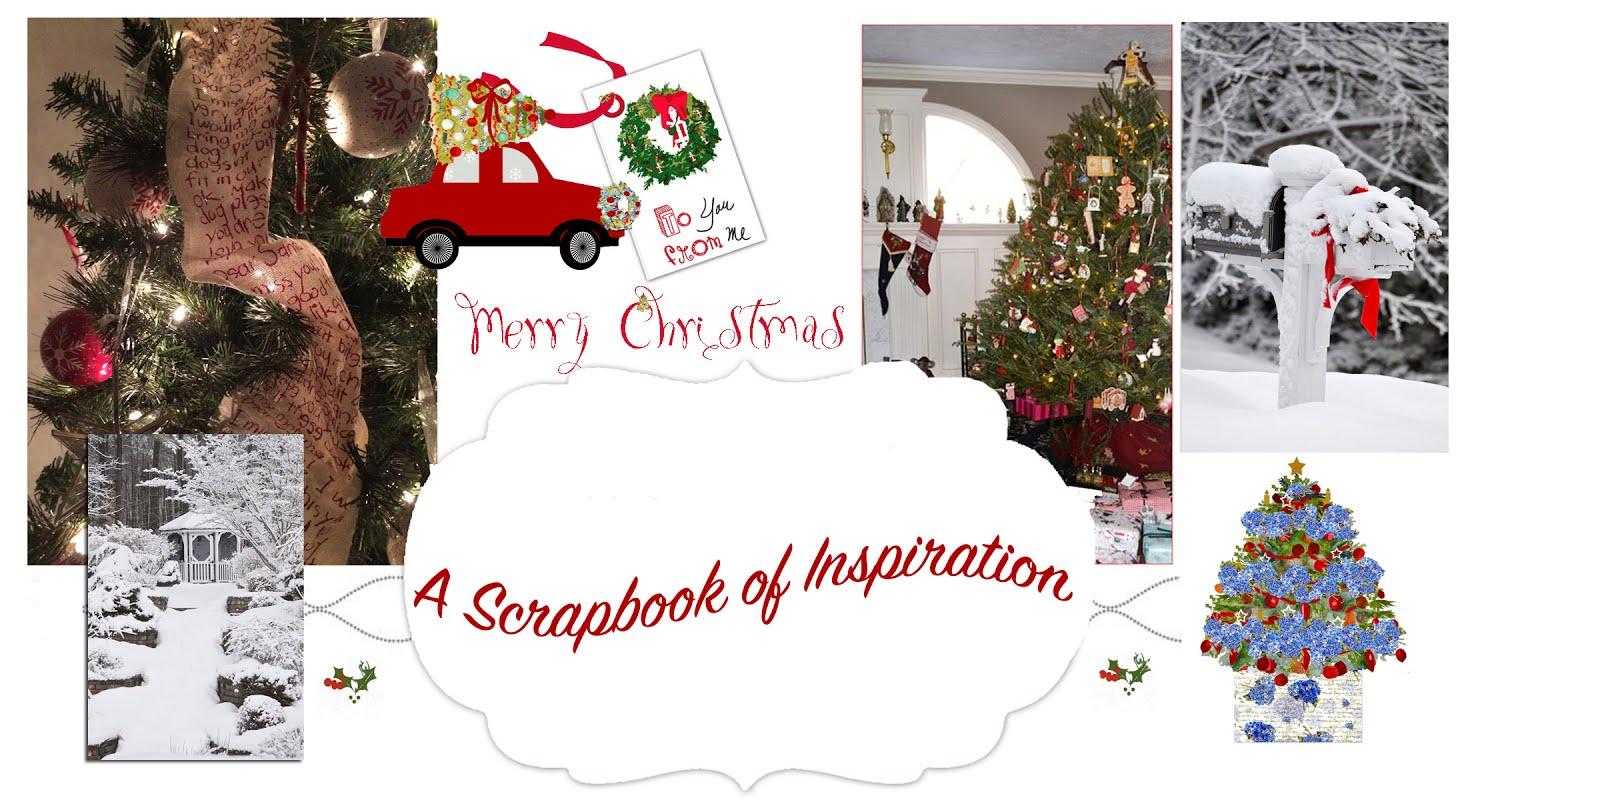 A SCRAPBOOK OF INSPIRATION